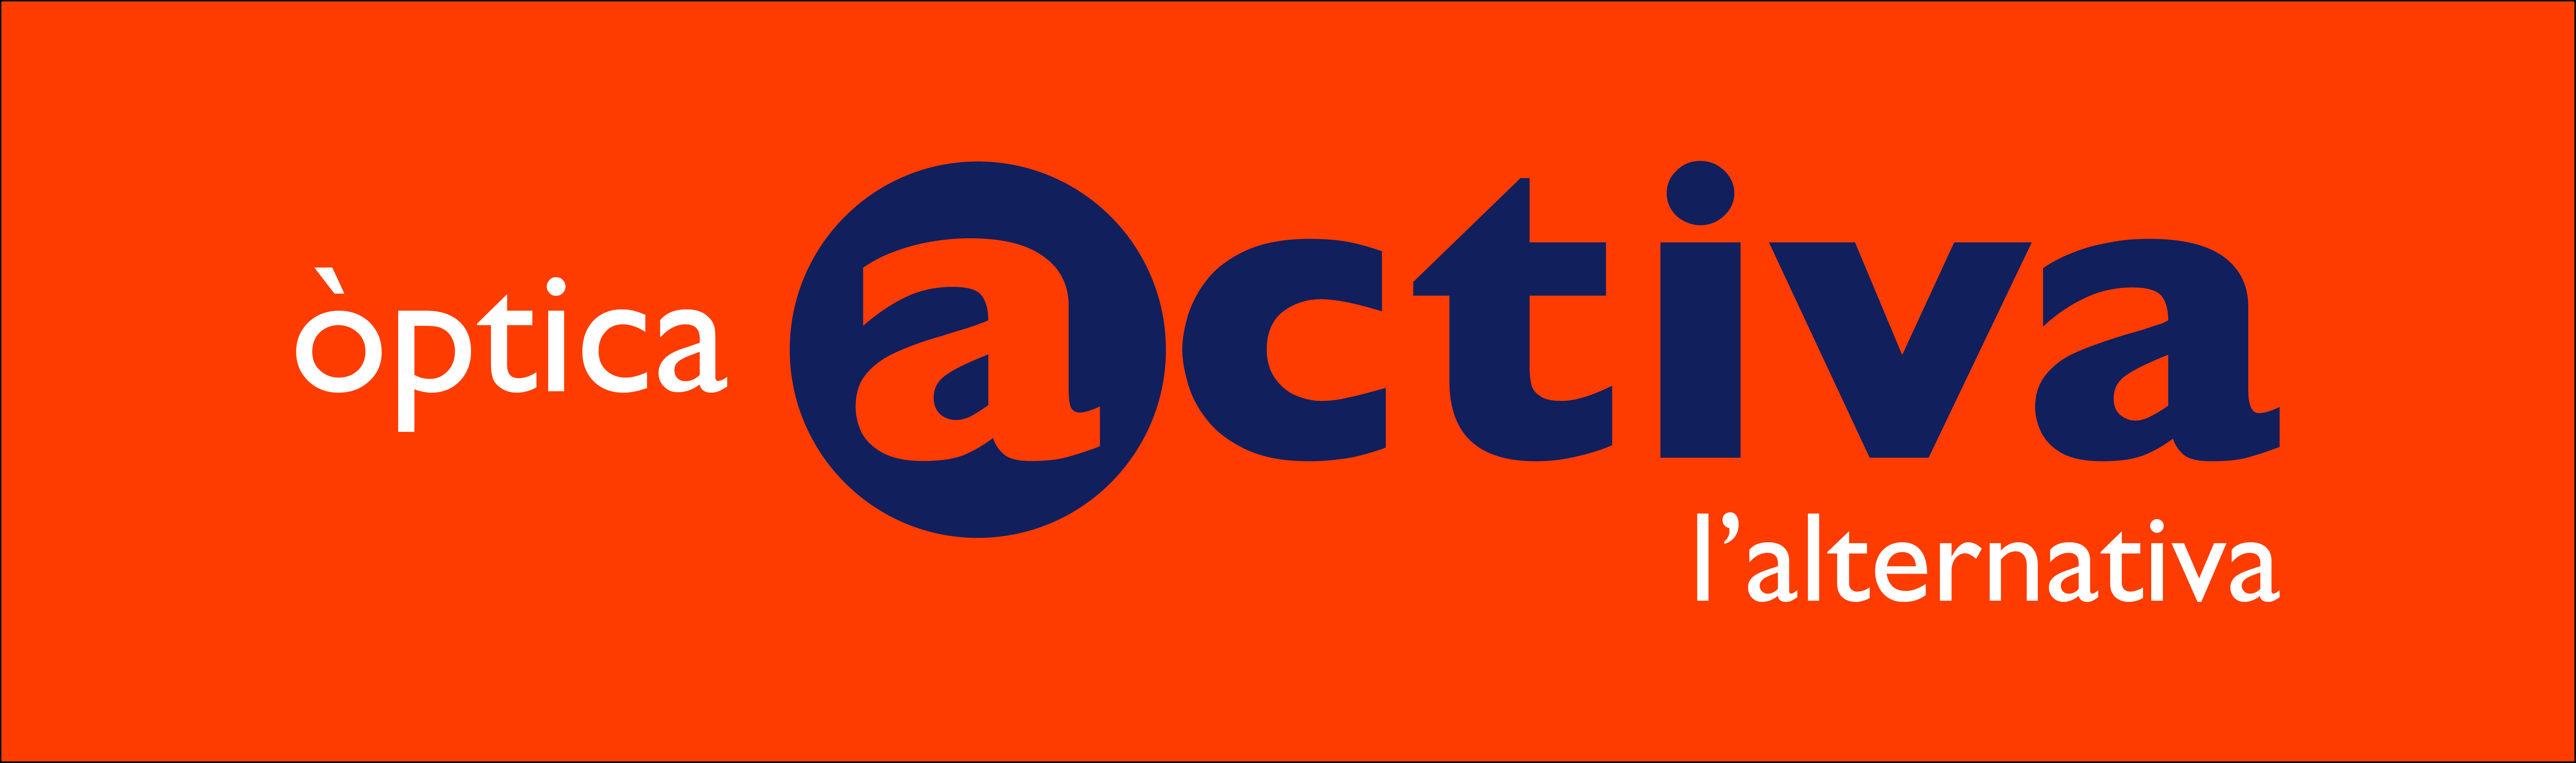 Logo comerç Òptica Activa - Imperial